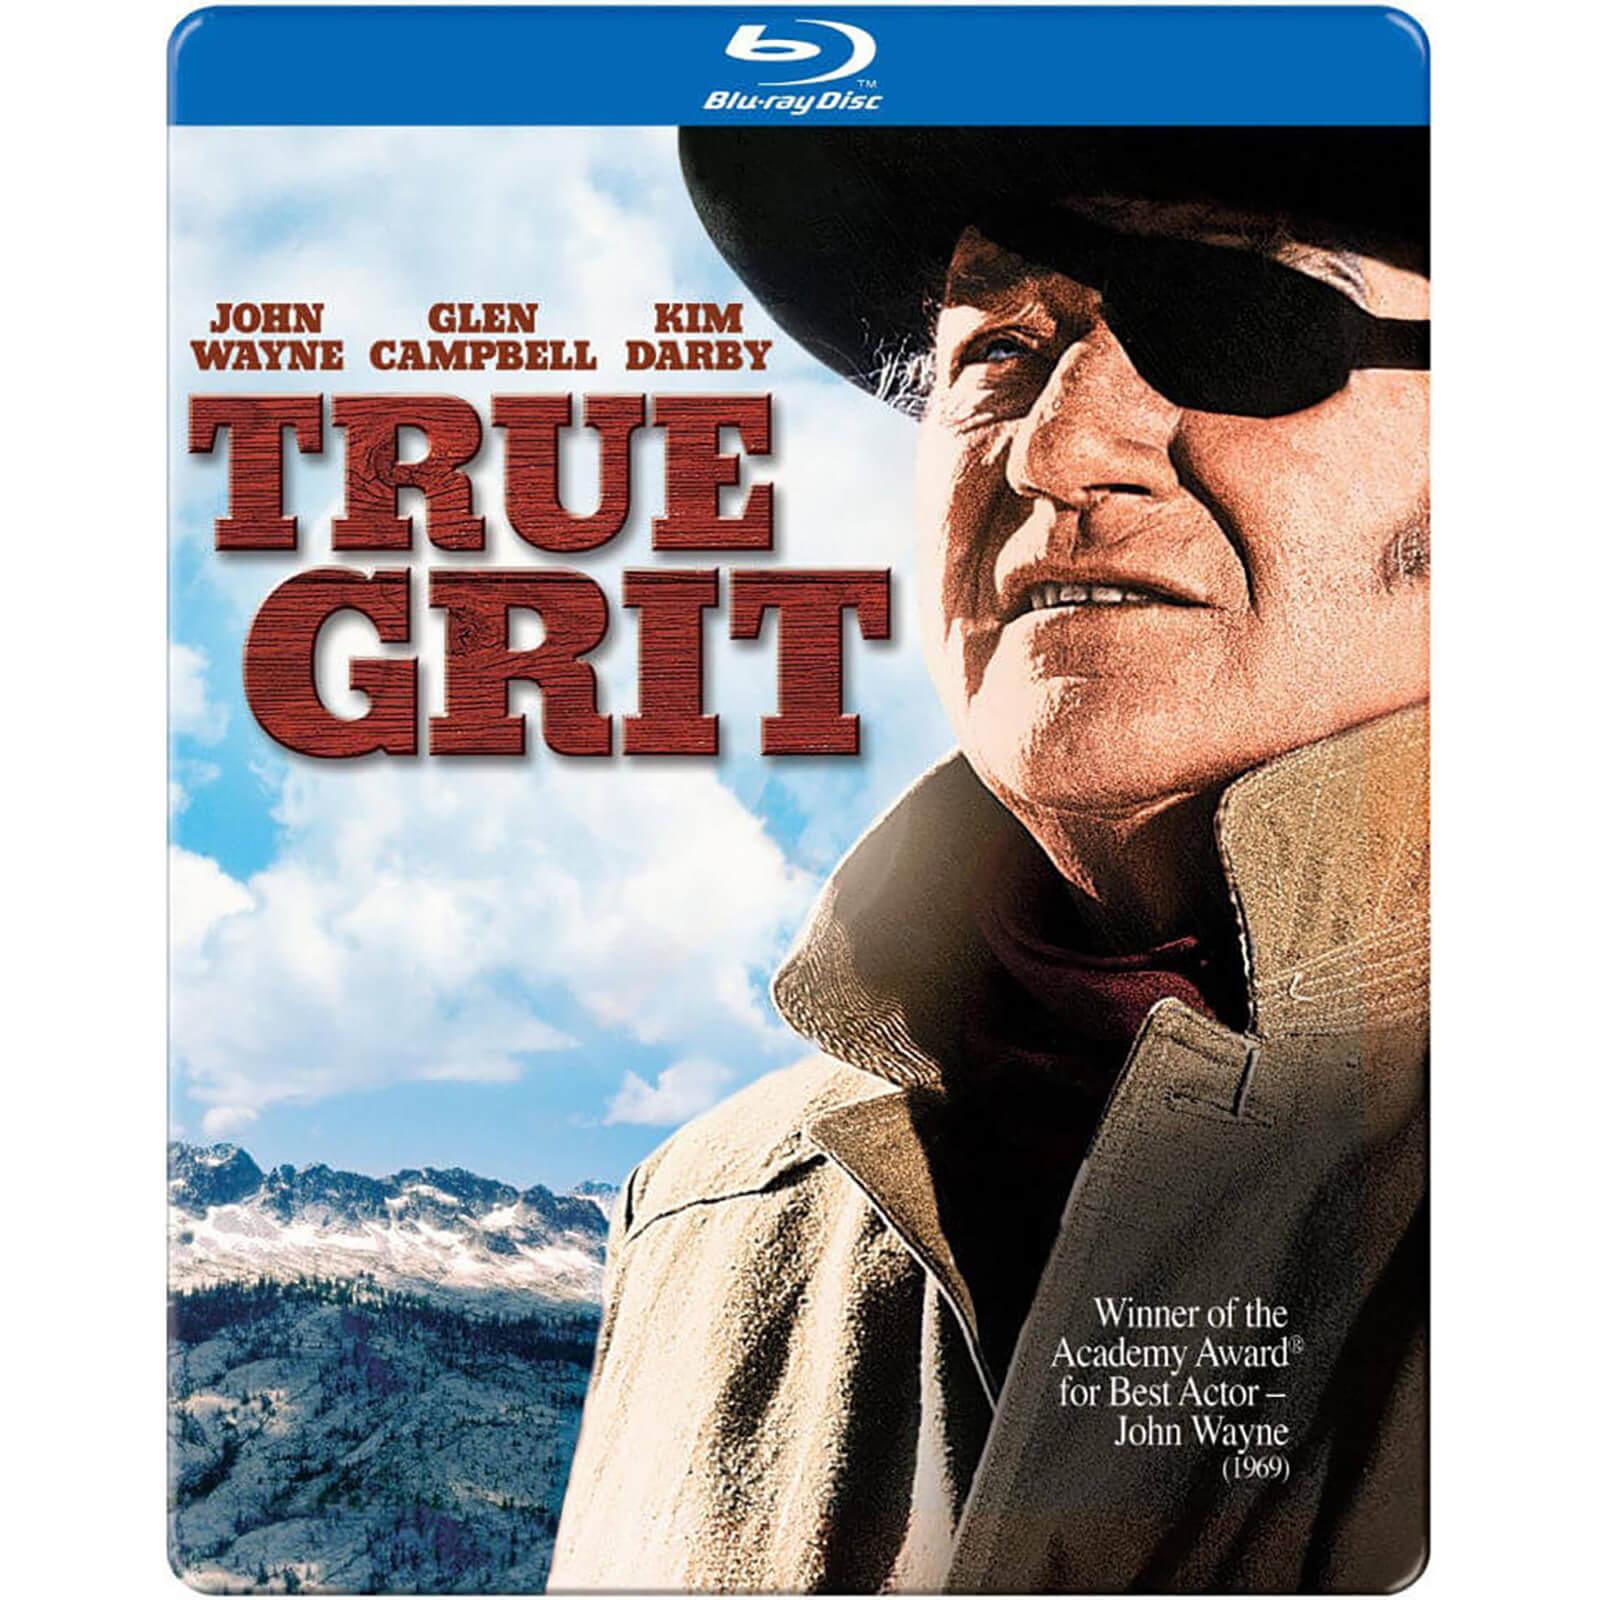 True Grit - Import - Limited Edition Steelbook (Region 1)